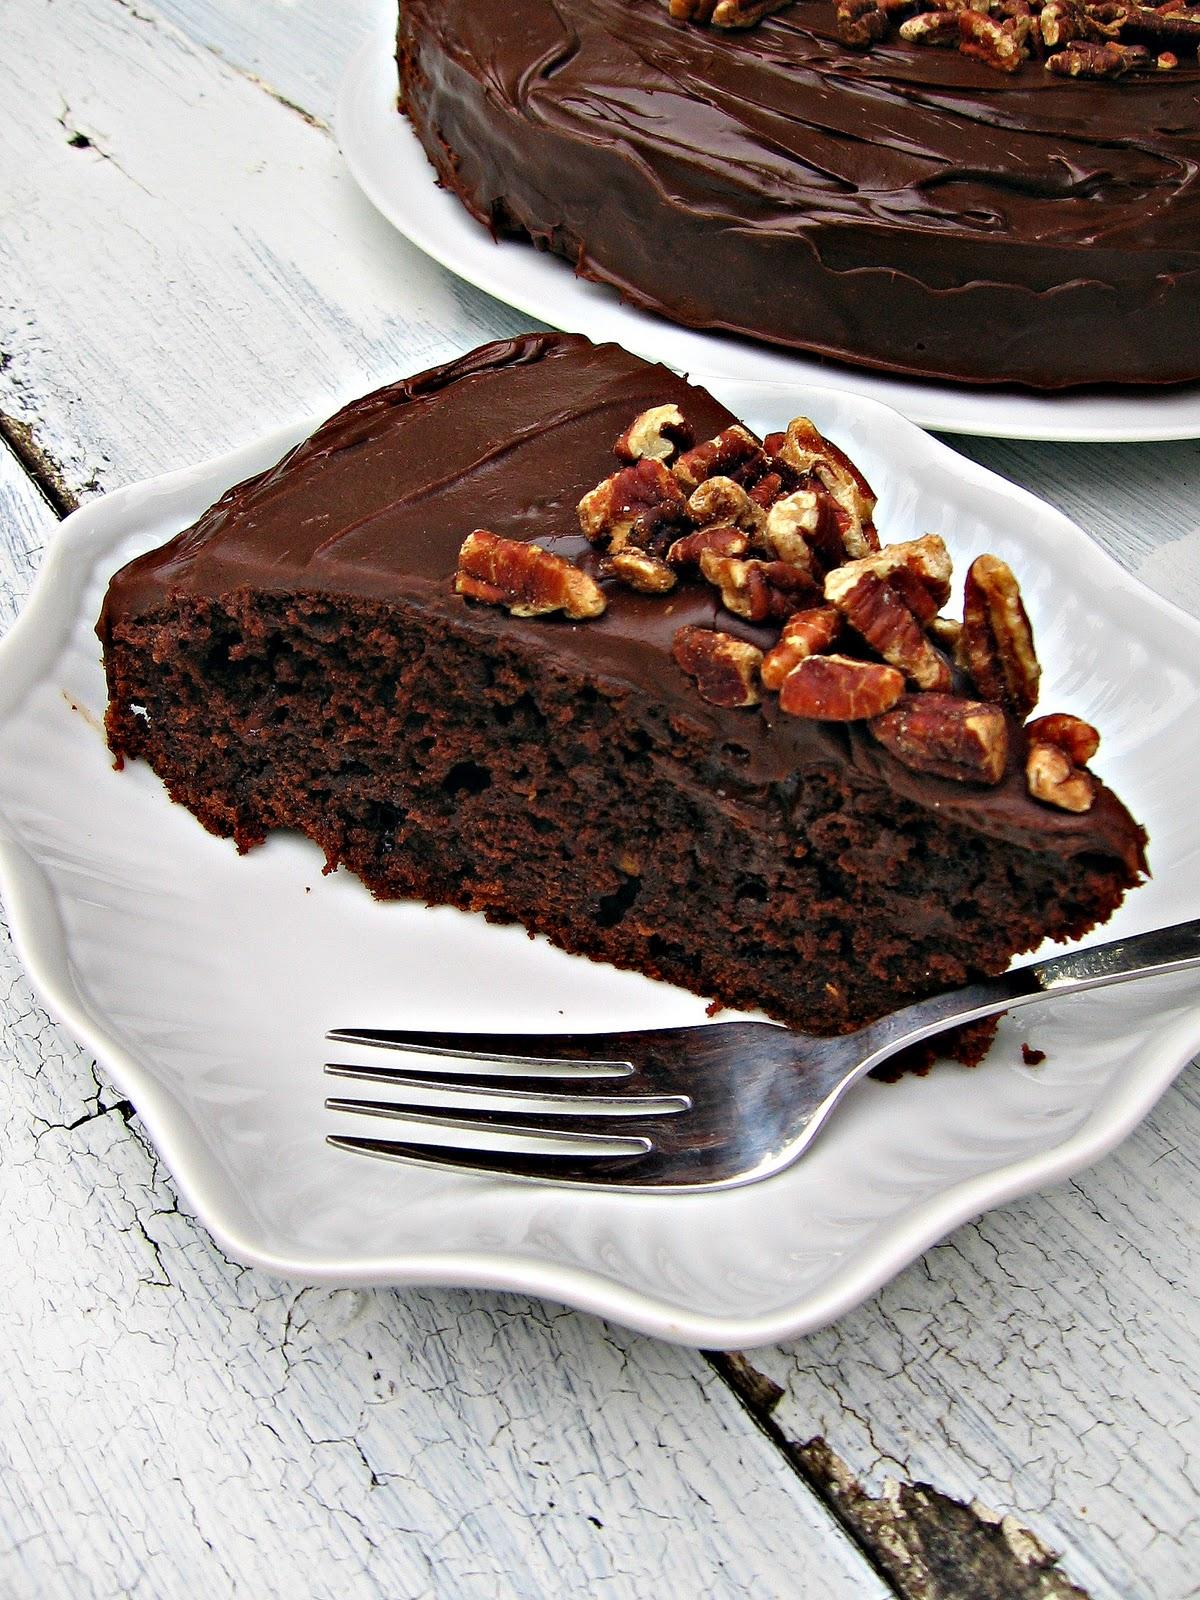 Ruby tuesday double chocolate cake recipe